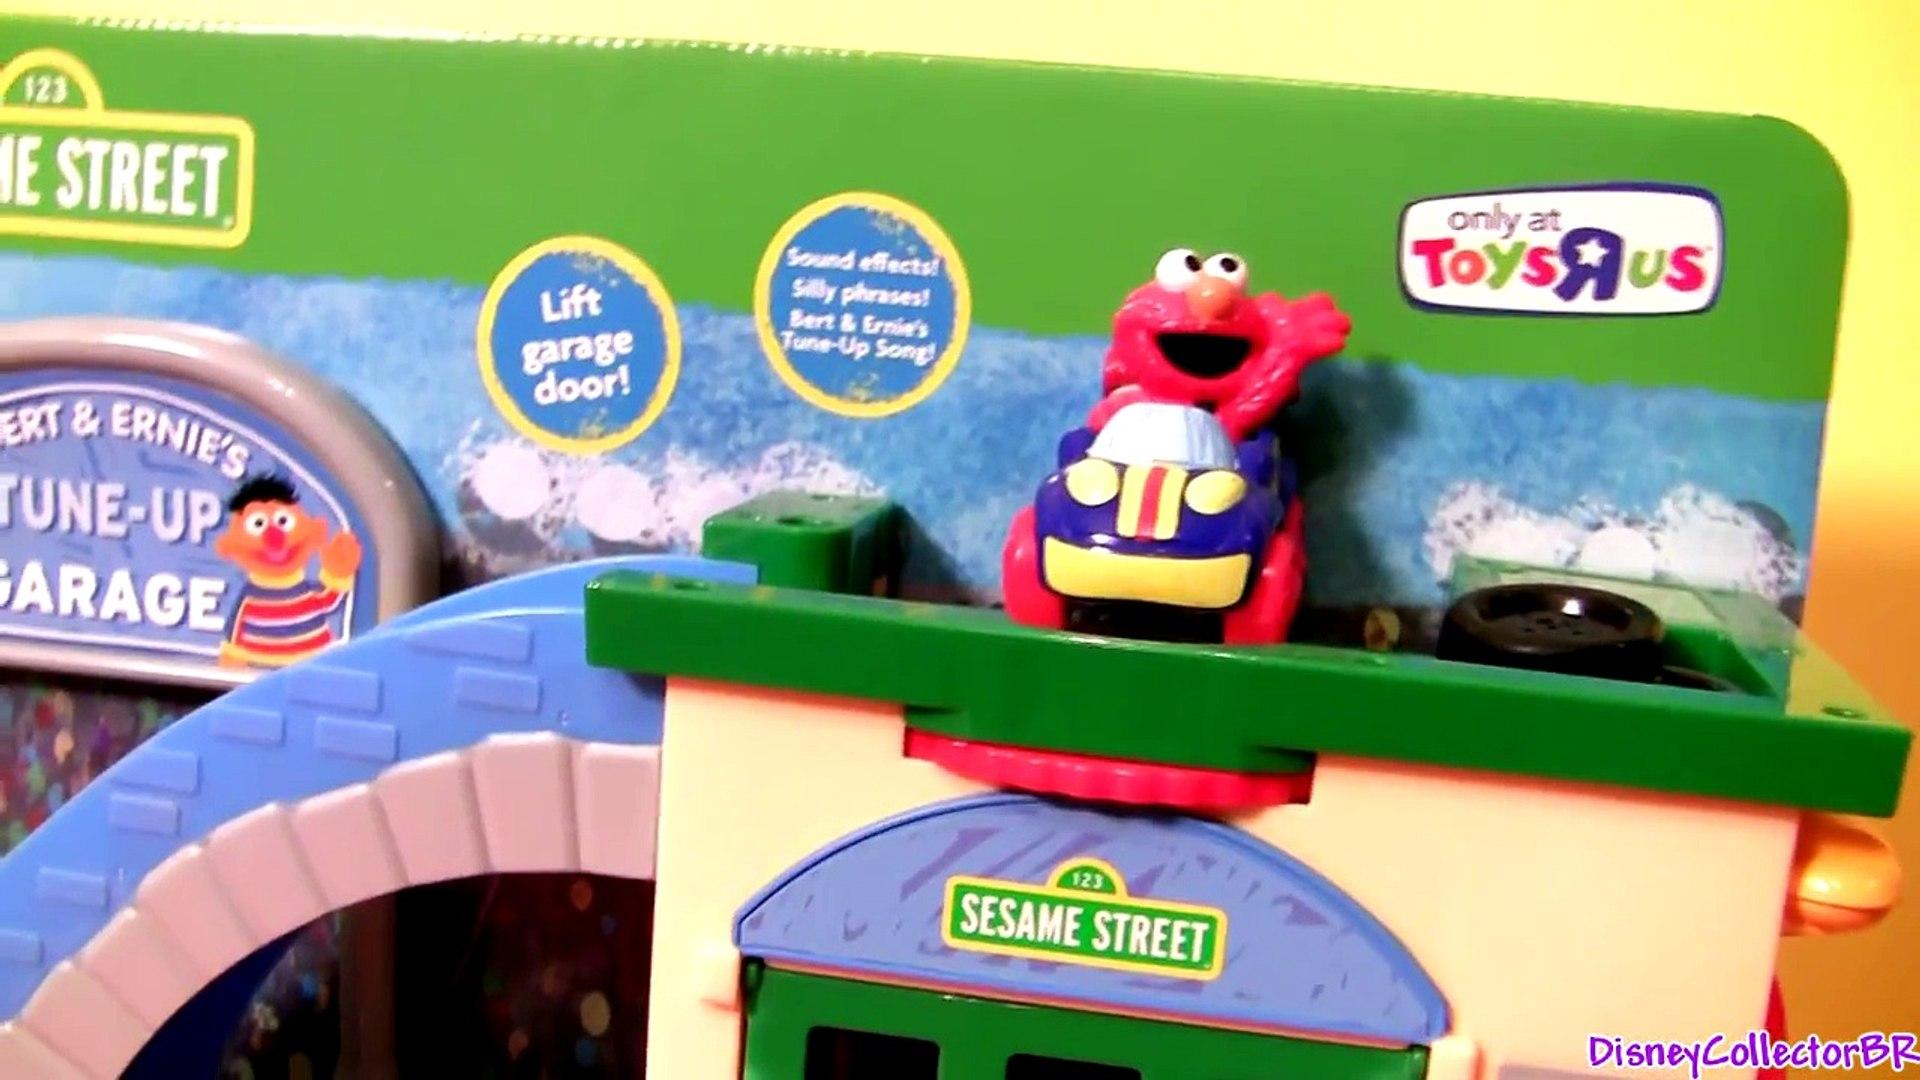 Sesame Street Tune-Up Garage Shop Race Cars Cookie Monster Elmo Mater Luigi Guido by Disne